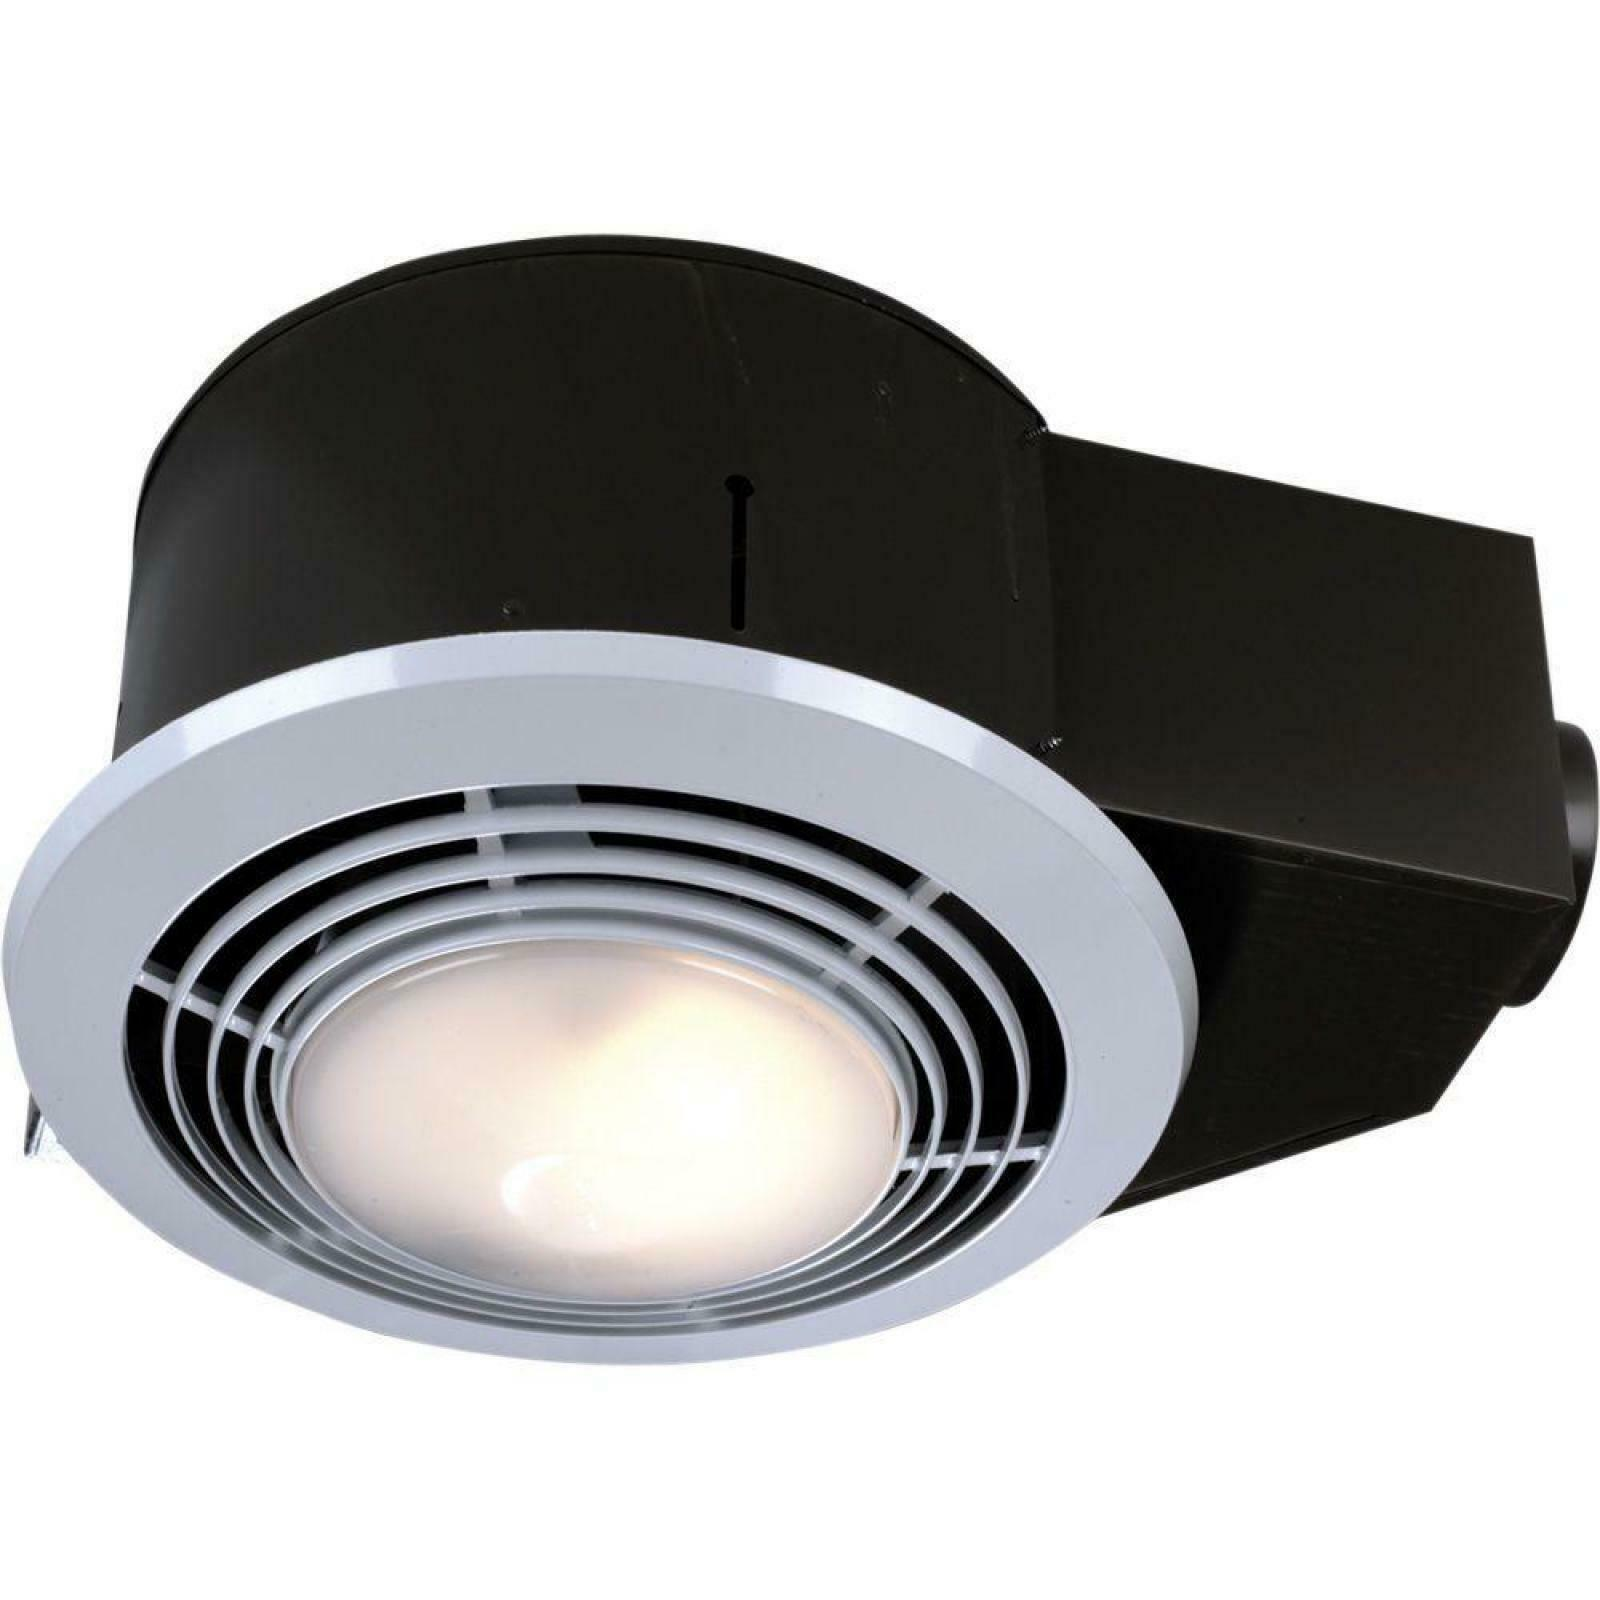 100 Cfm Ceiling Bathroom Exhaust Fan With Light Heater